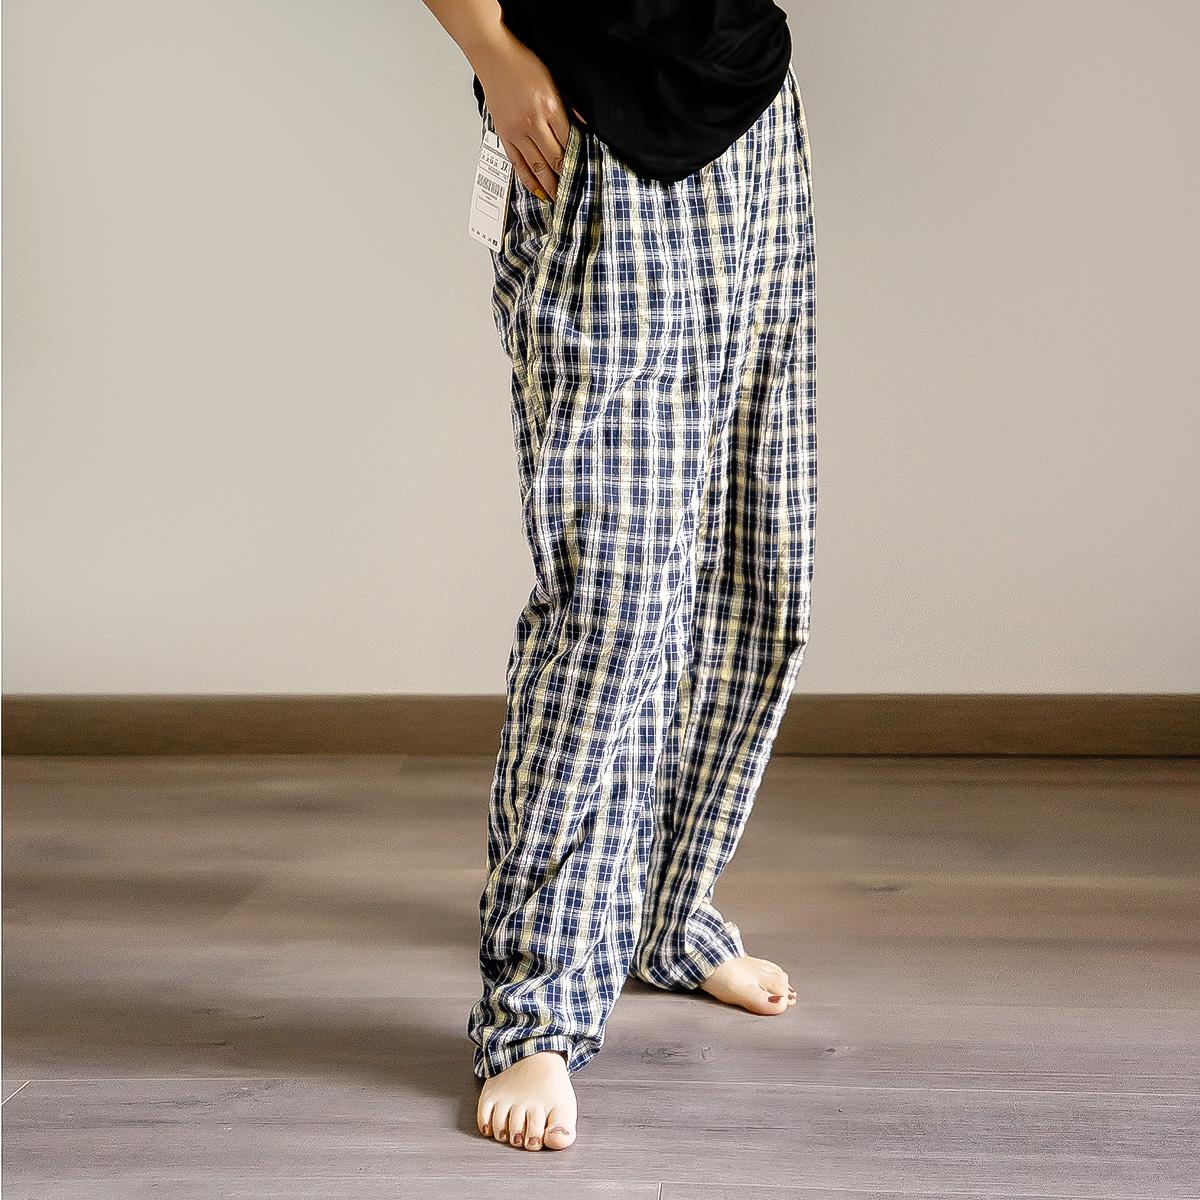 Rose whale Japanese loose straight high waist thin drape pants summer cotton plaid pants female